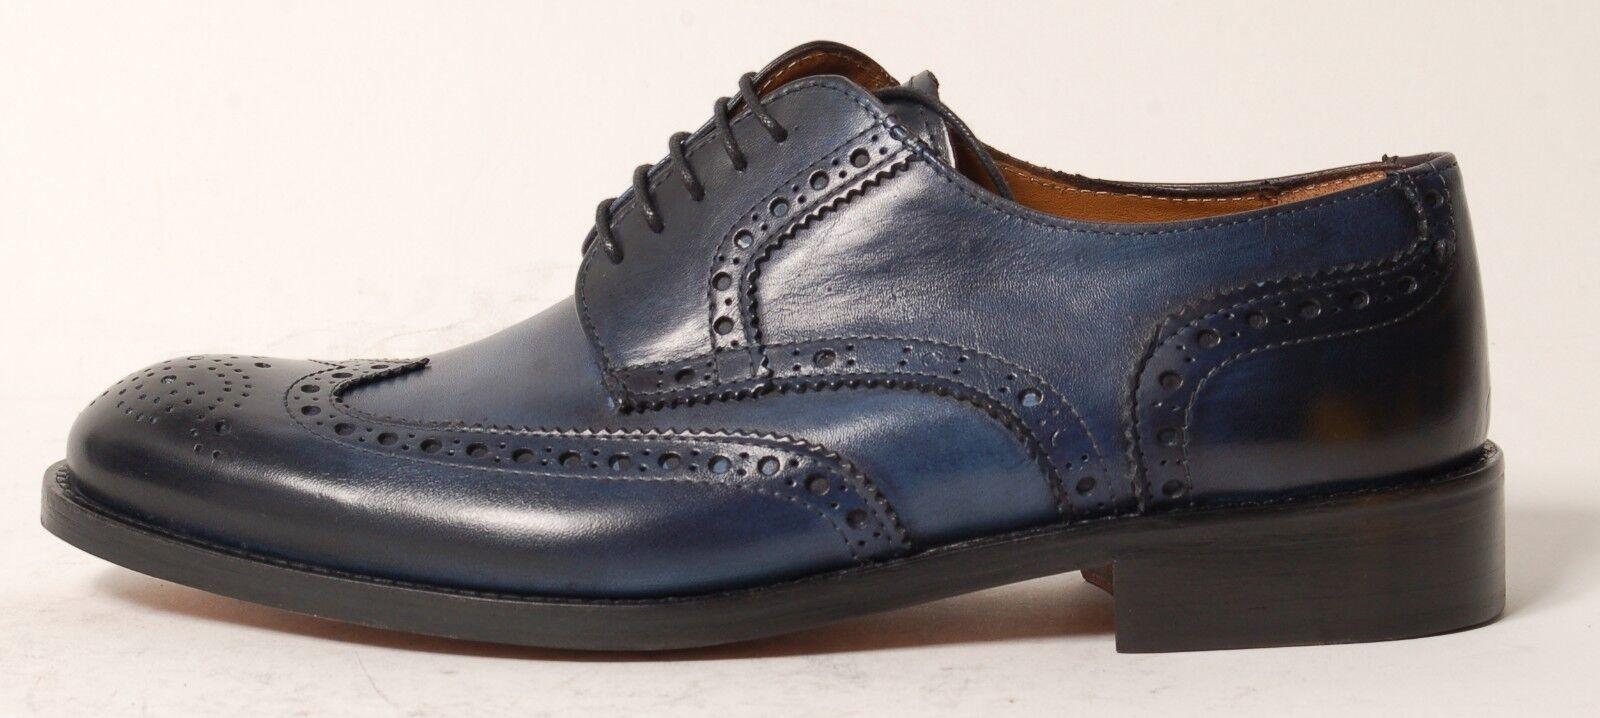 Chaussures - Antica Calzoleria Campana Mod. 1220 Déstockage ! ! ! 30% Remise 5f7d3b